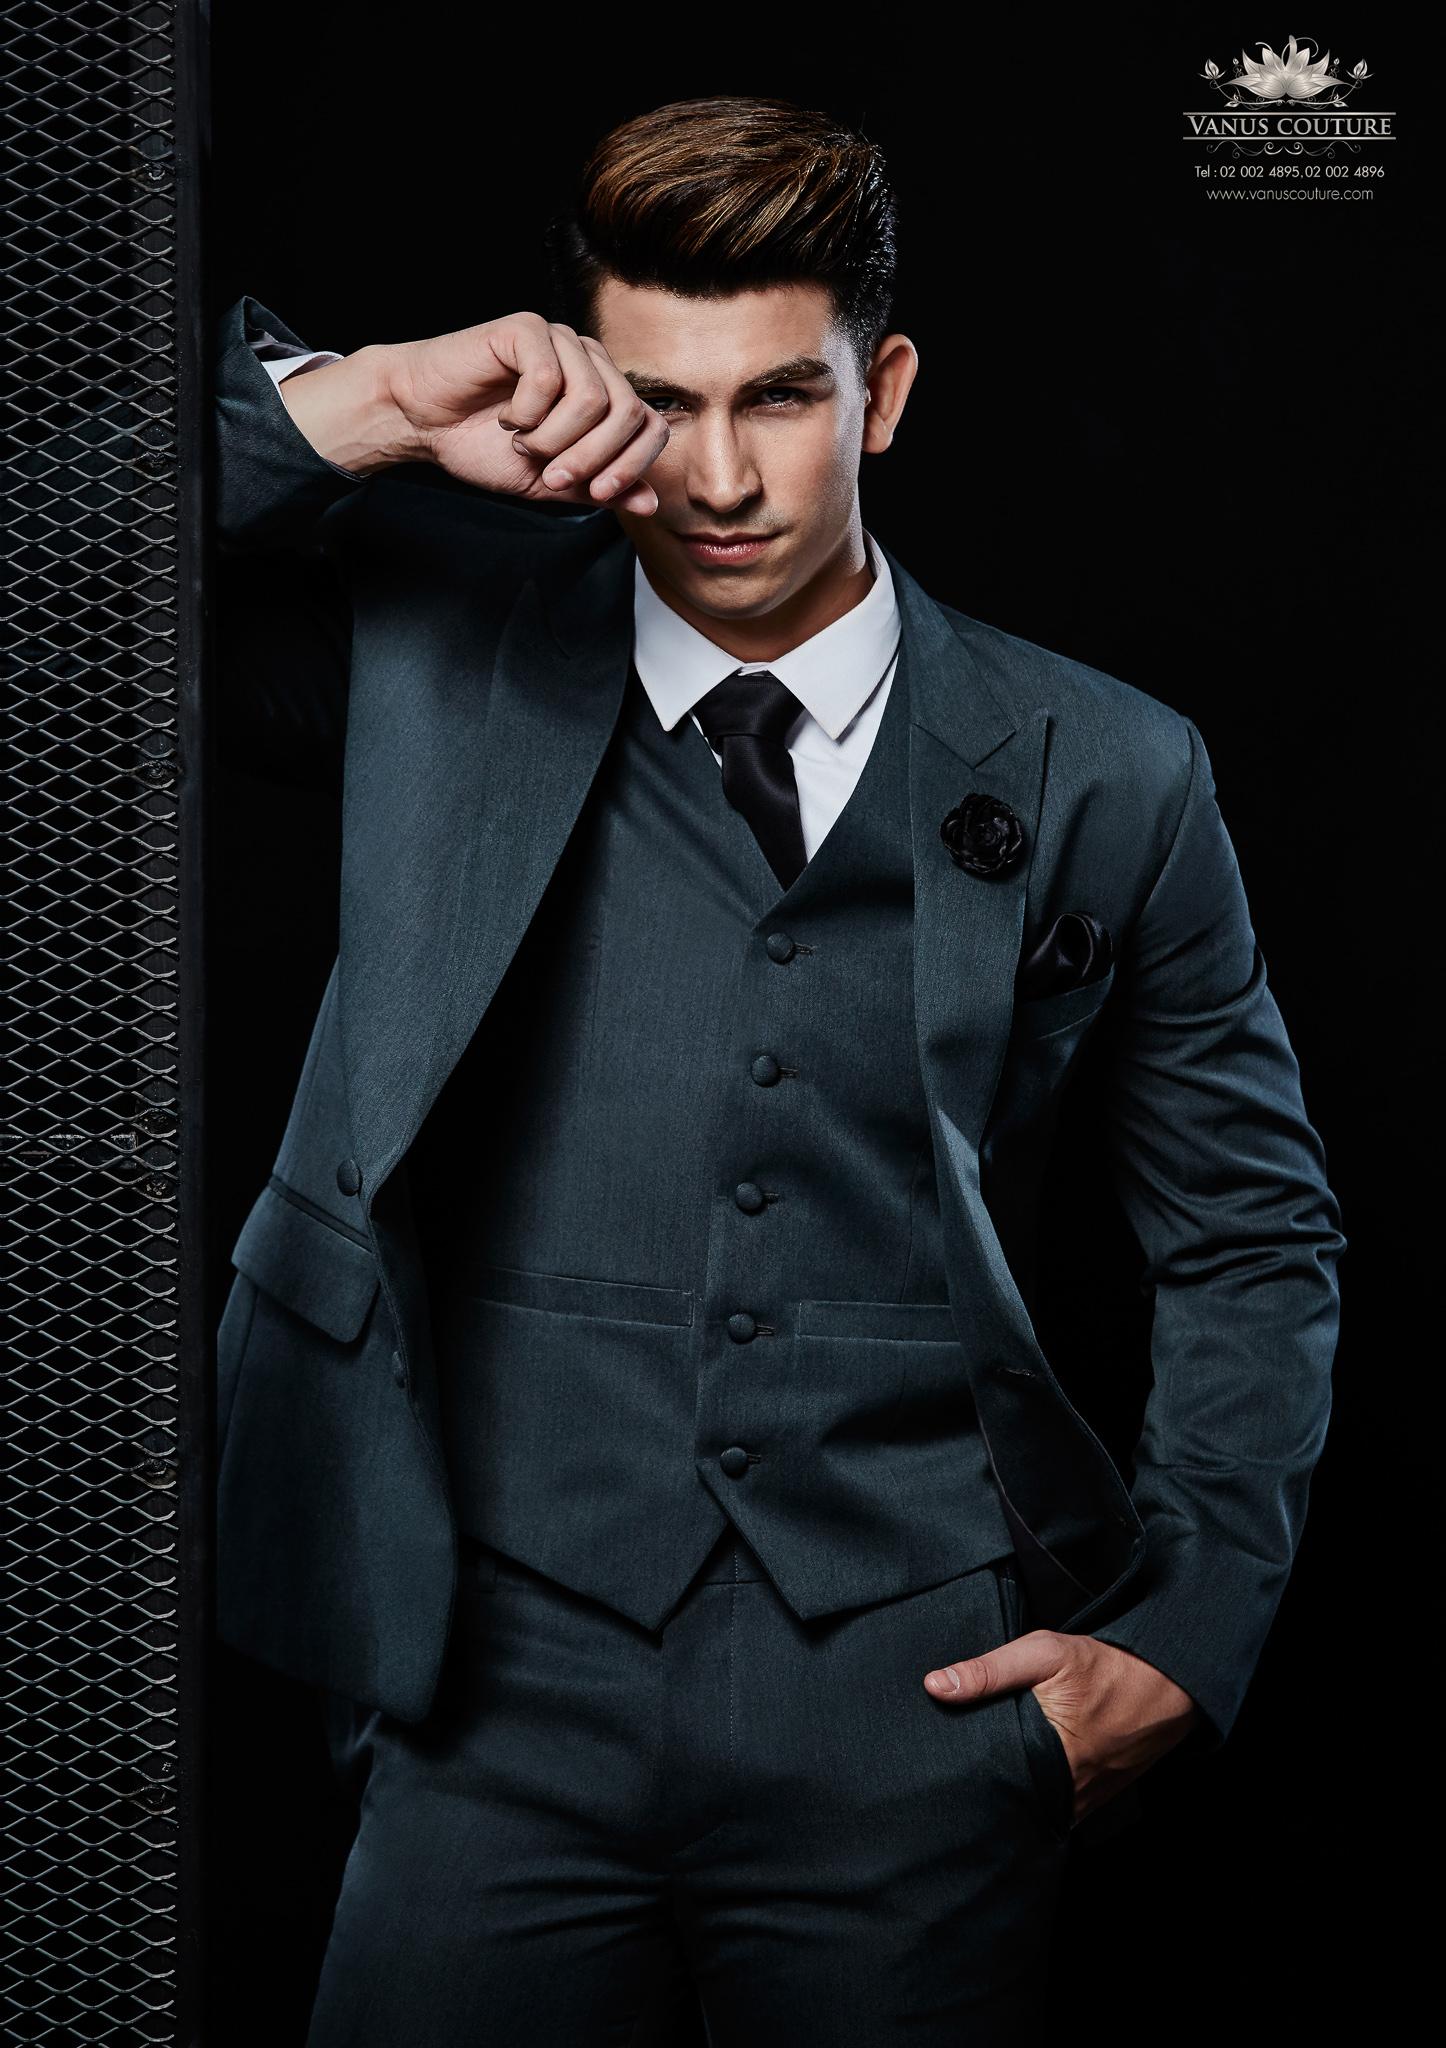 Groom suit - Antoun